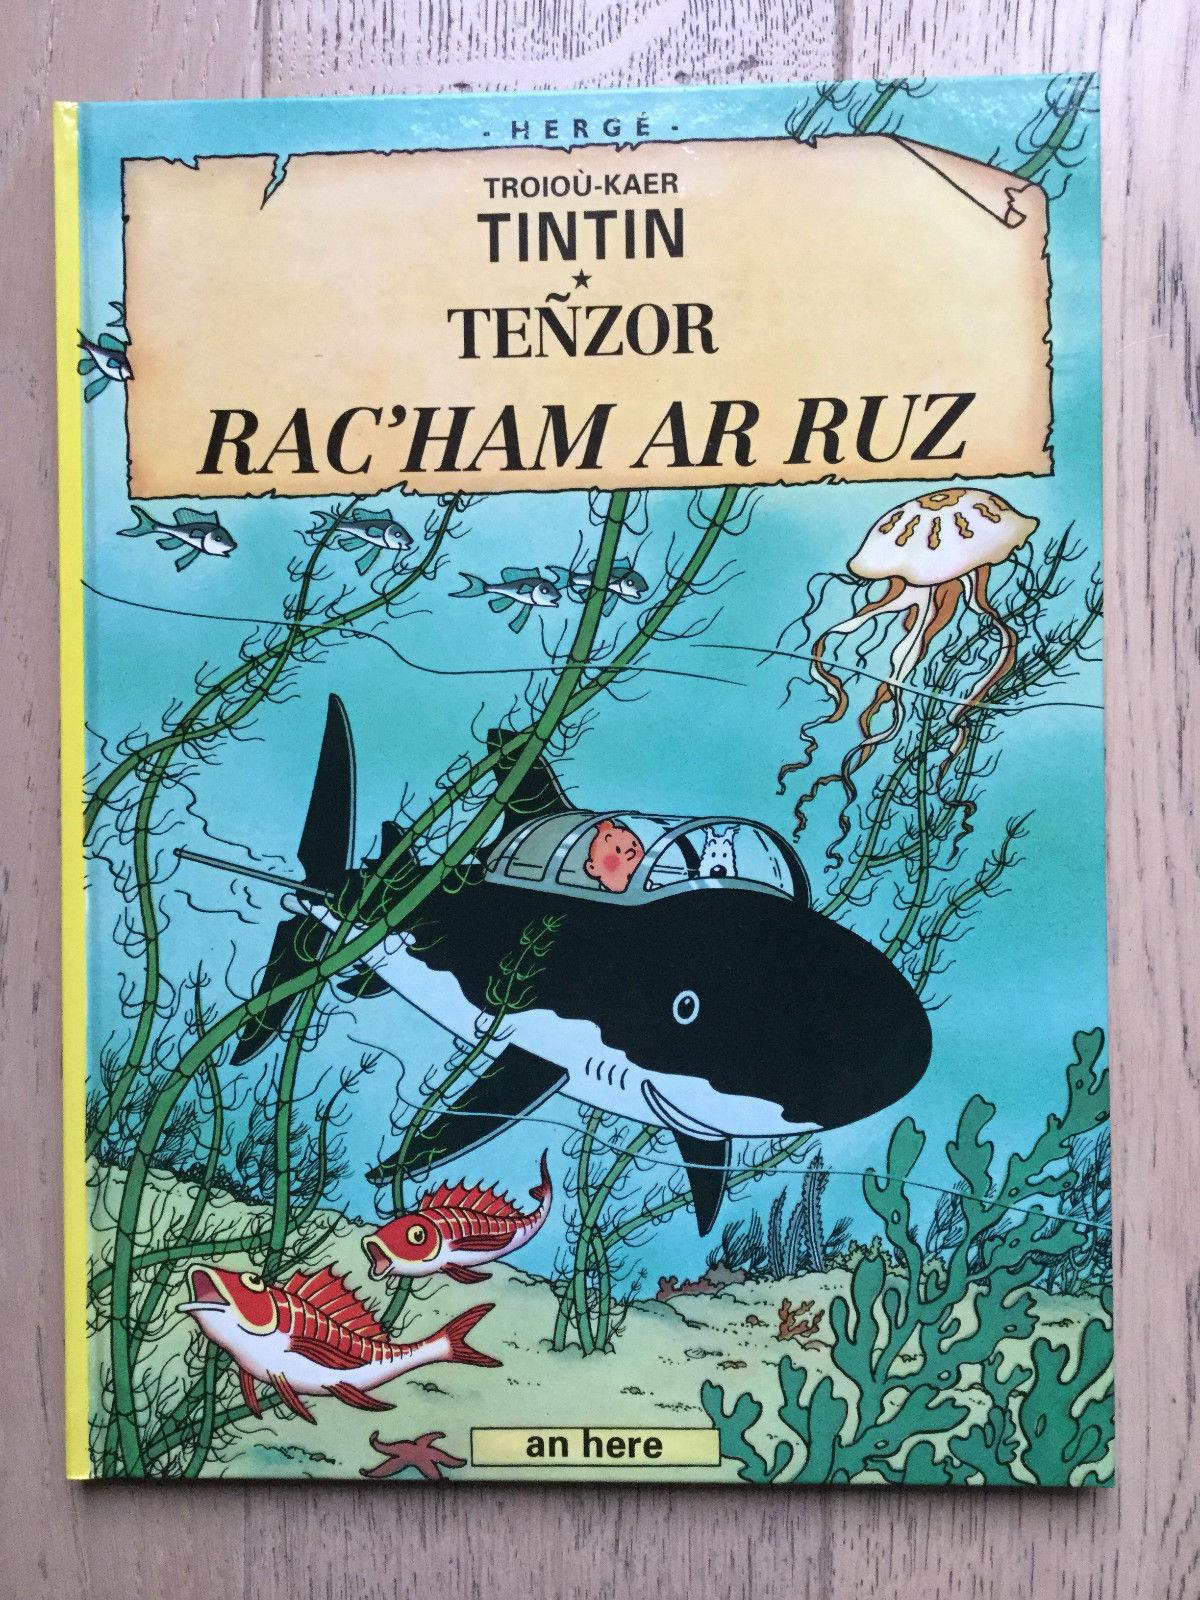 Tintin Hergé - Rackham le Rouge en Breton - Première Edition 1993 - Etat neuf